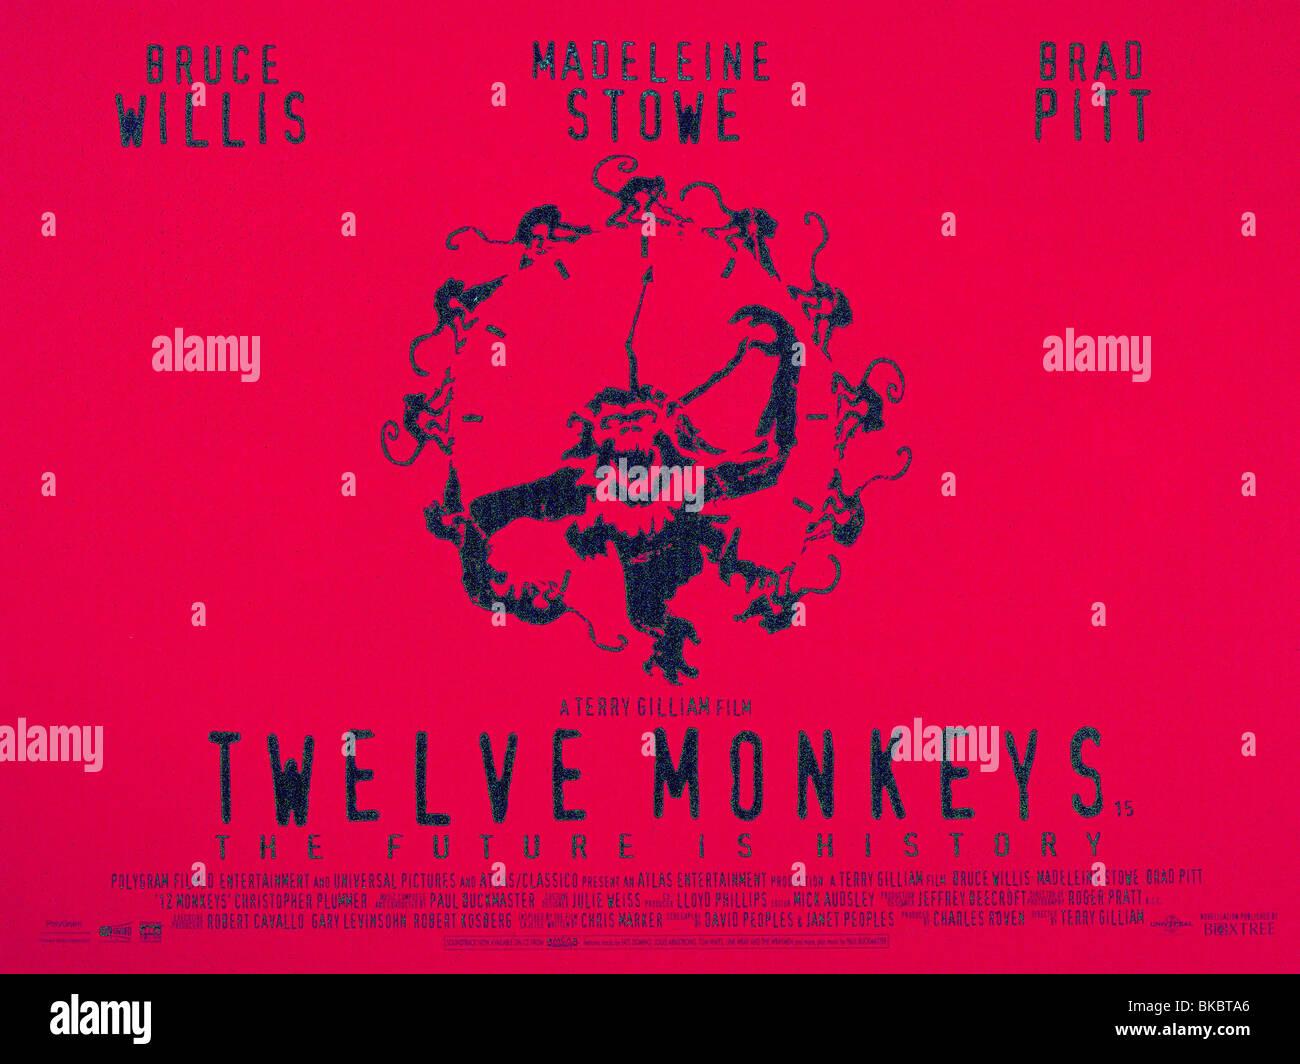 TWELVE MONKEYS -1995 POSTER - Stock Image